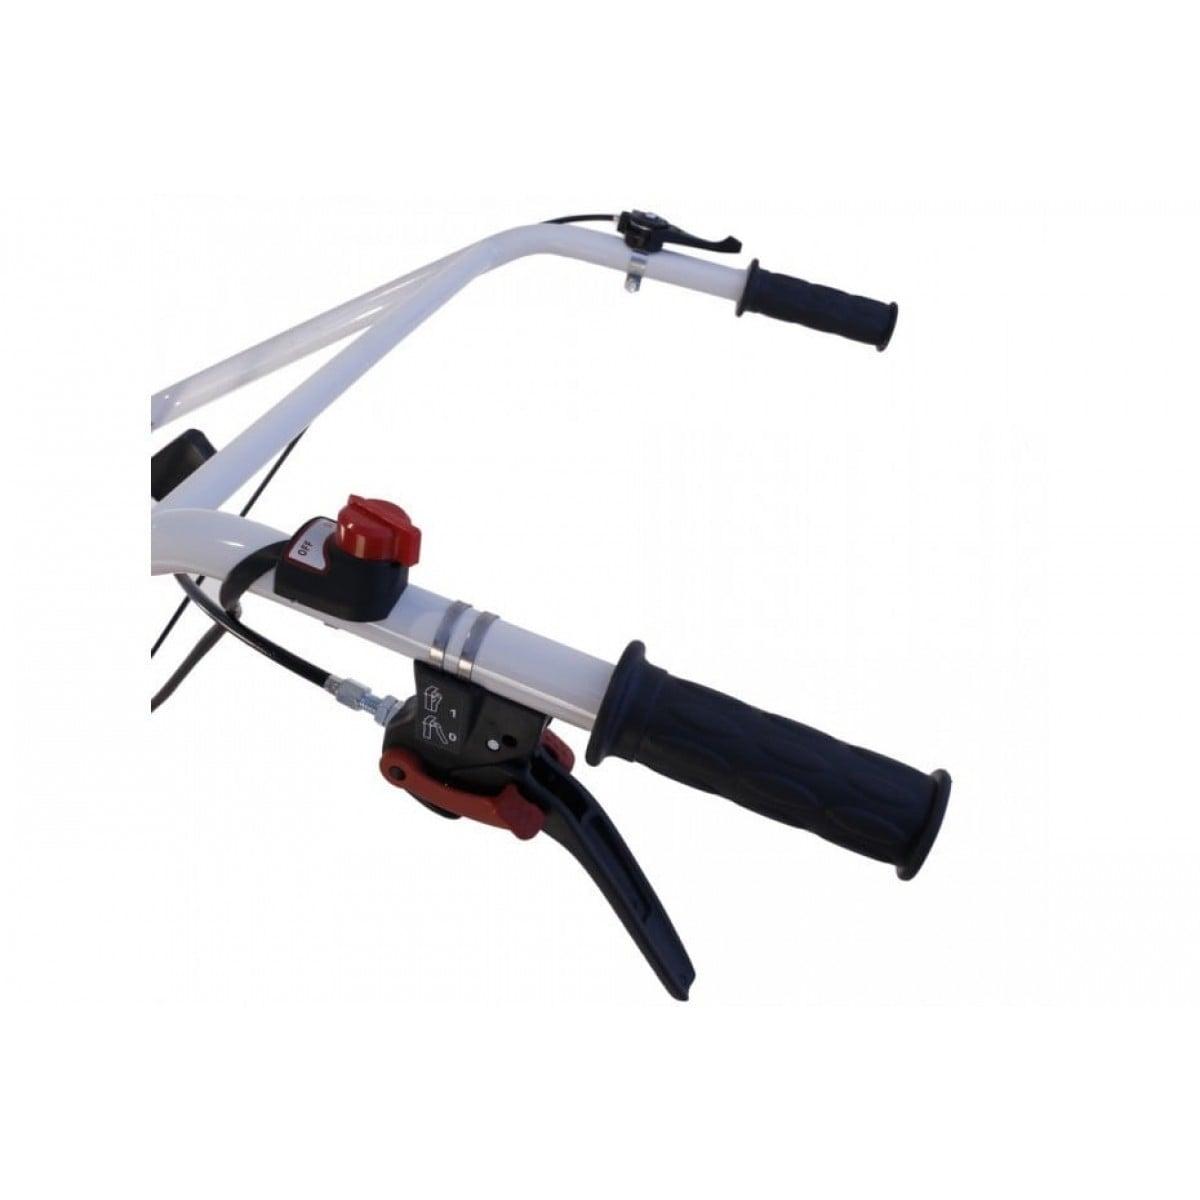 motocultor loncin lc750 7cp o mac.ro 12 2 70